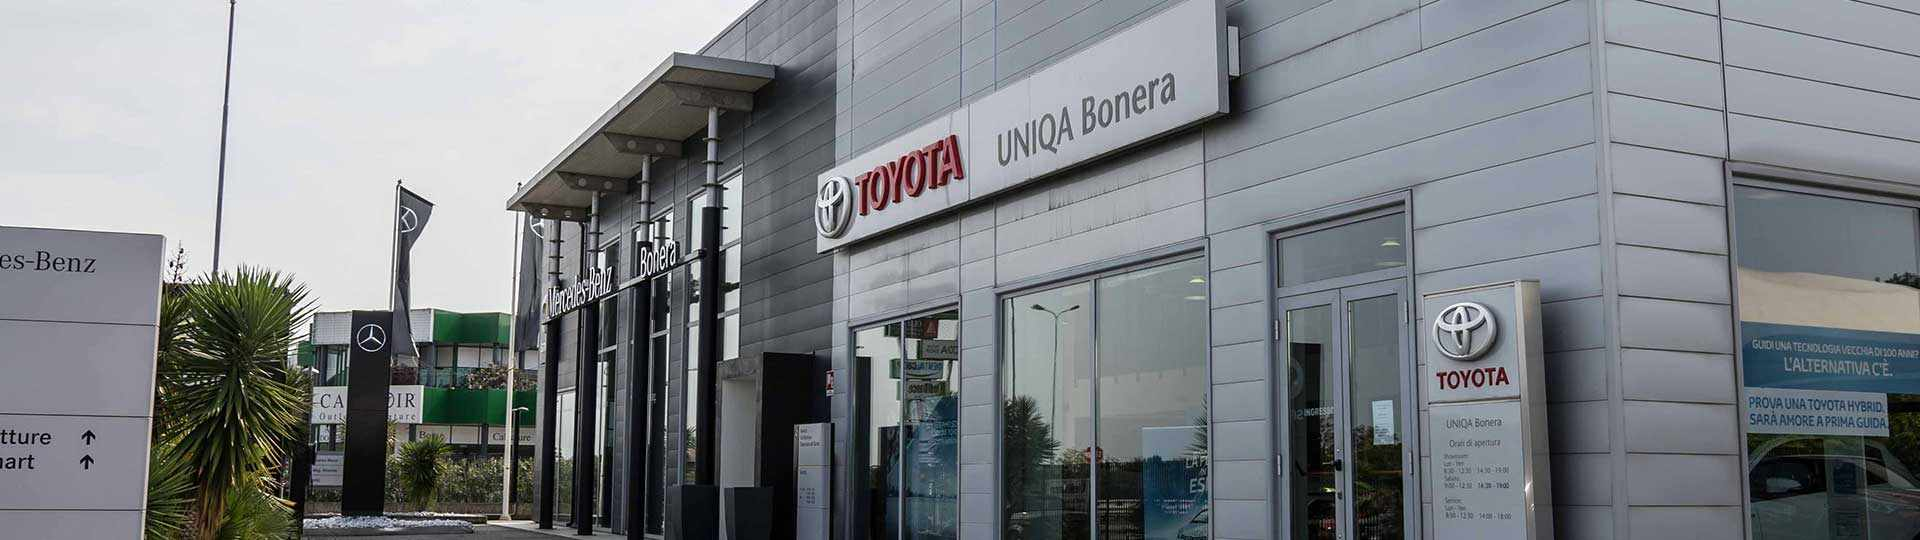 header_concessionaria_toyota_bonera_lonato_garda_00.jpg